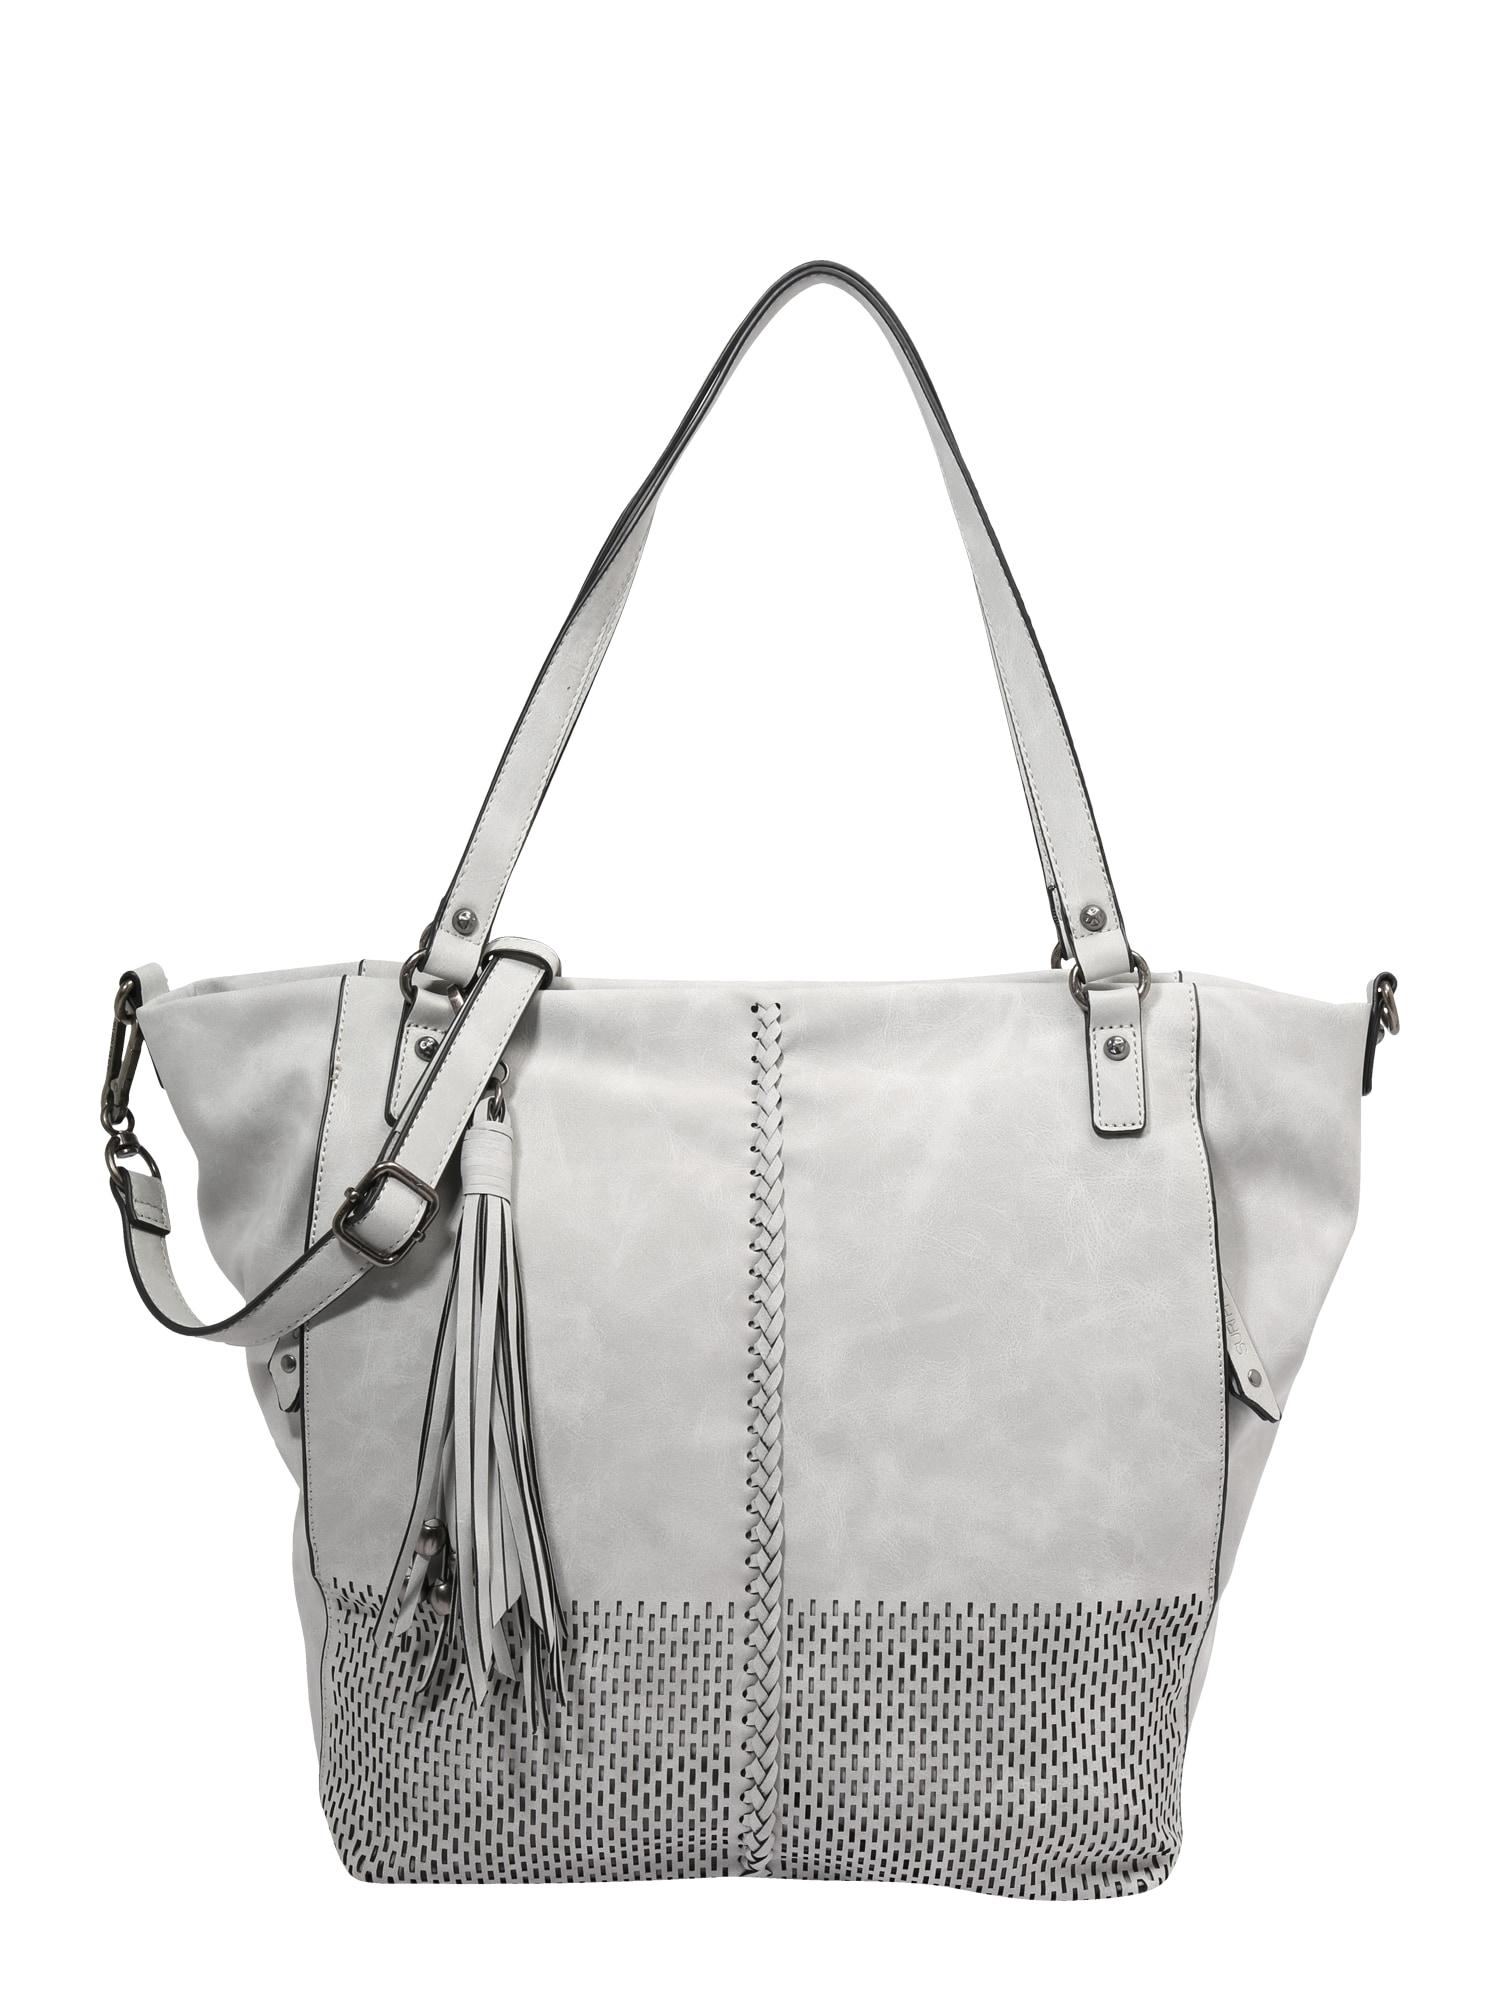 Nákupní taška Laury šedá Suri Frey